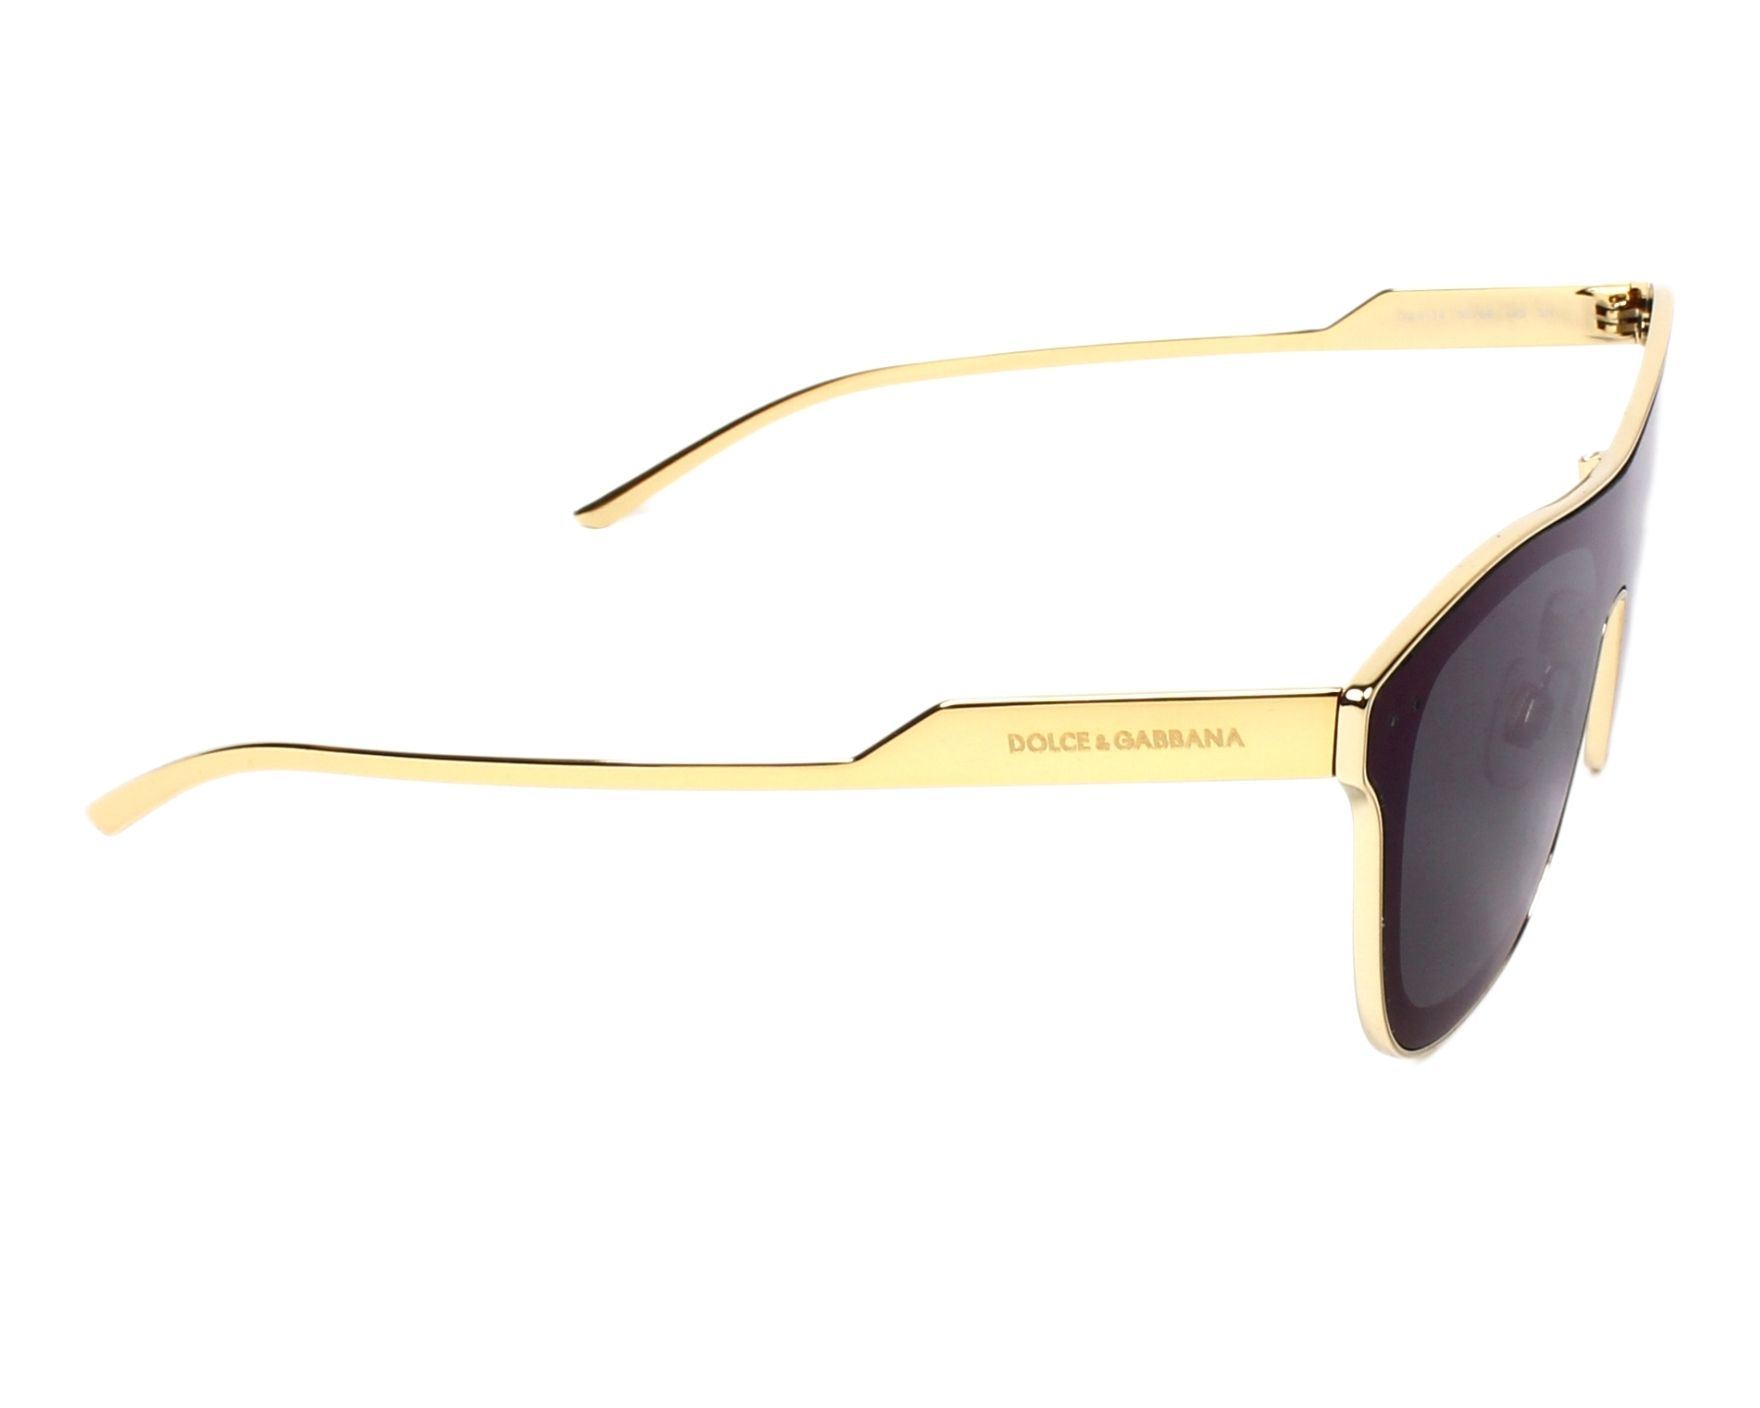 thumbnail Sunglasses Dolce   Gabbana DG-2174 02 96 42- Gold side view 5001c09410